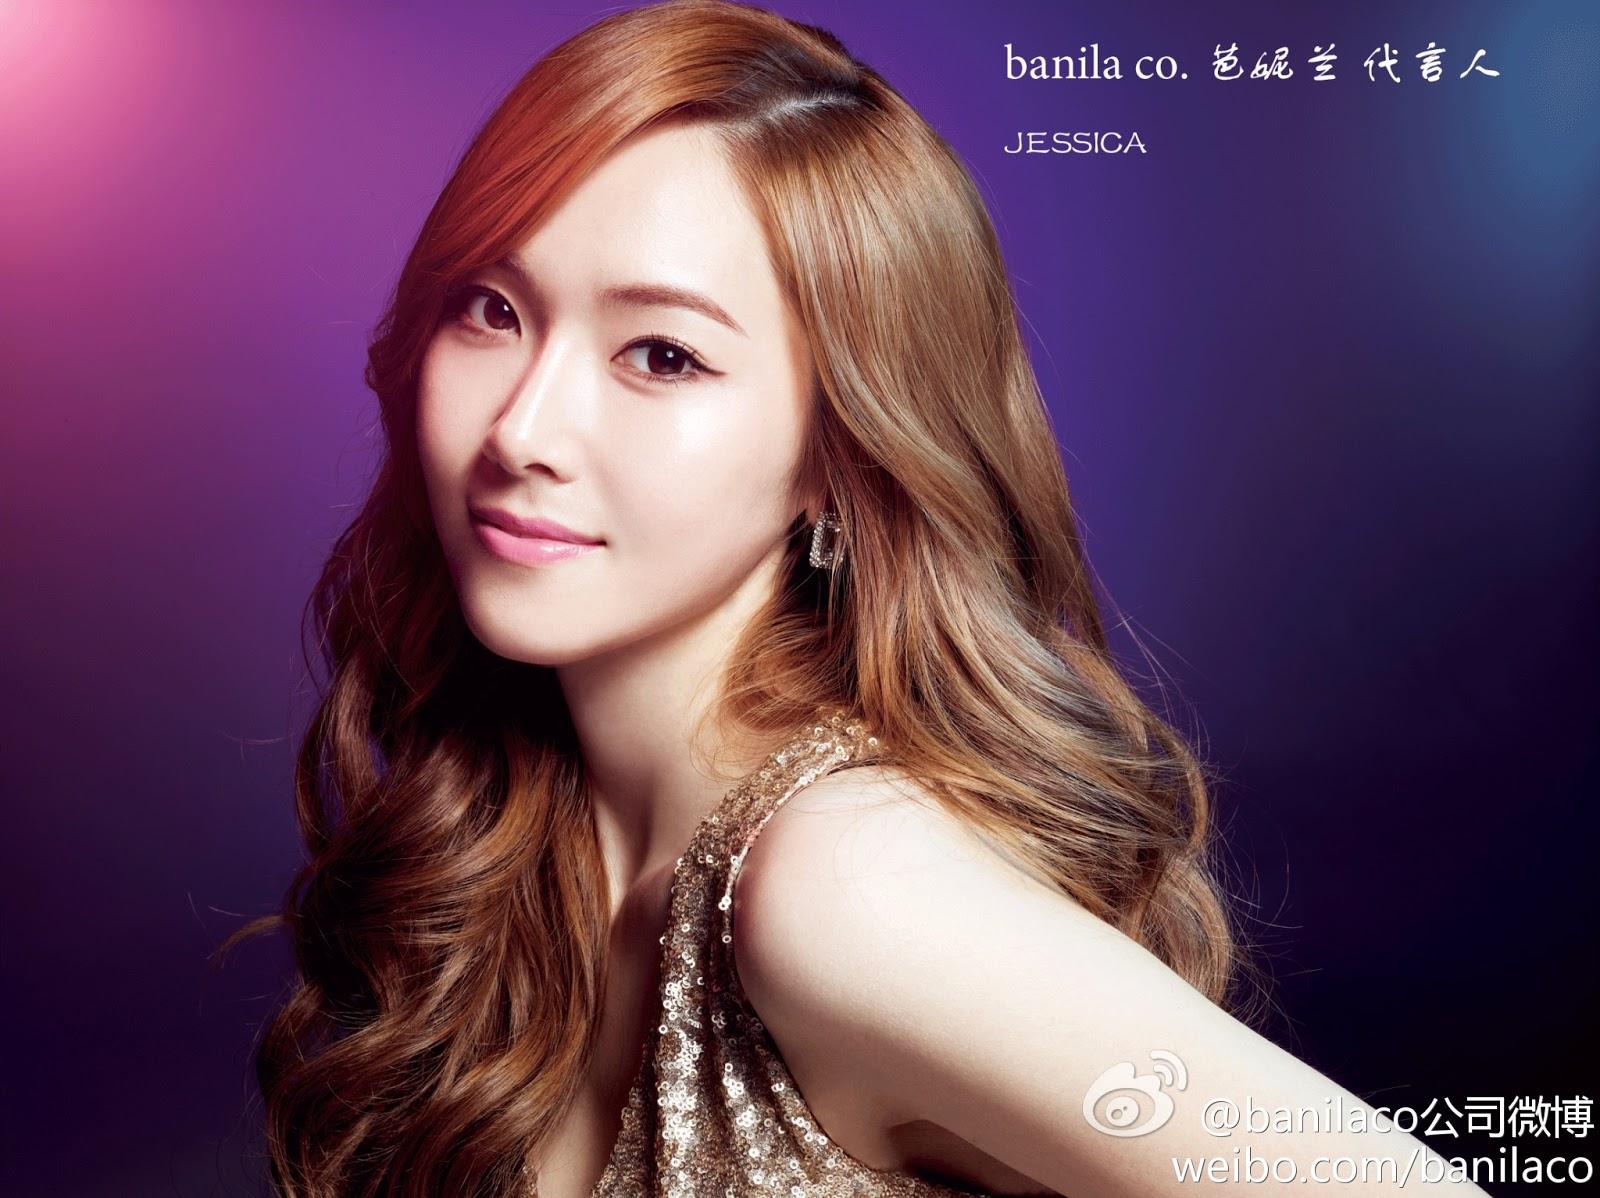 Jessica ost dating agency cyrano